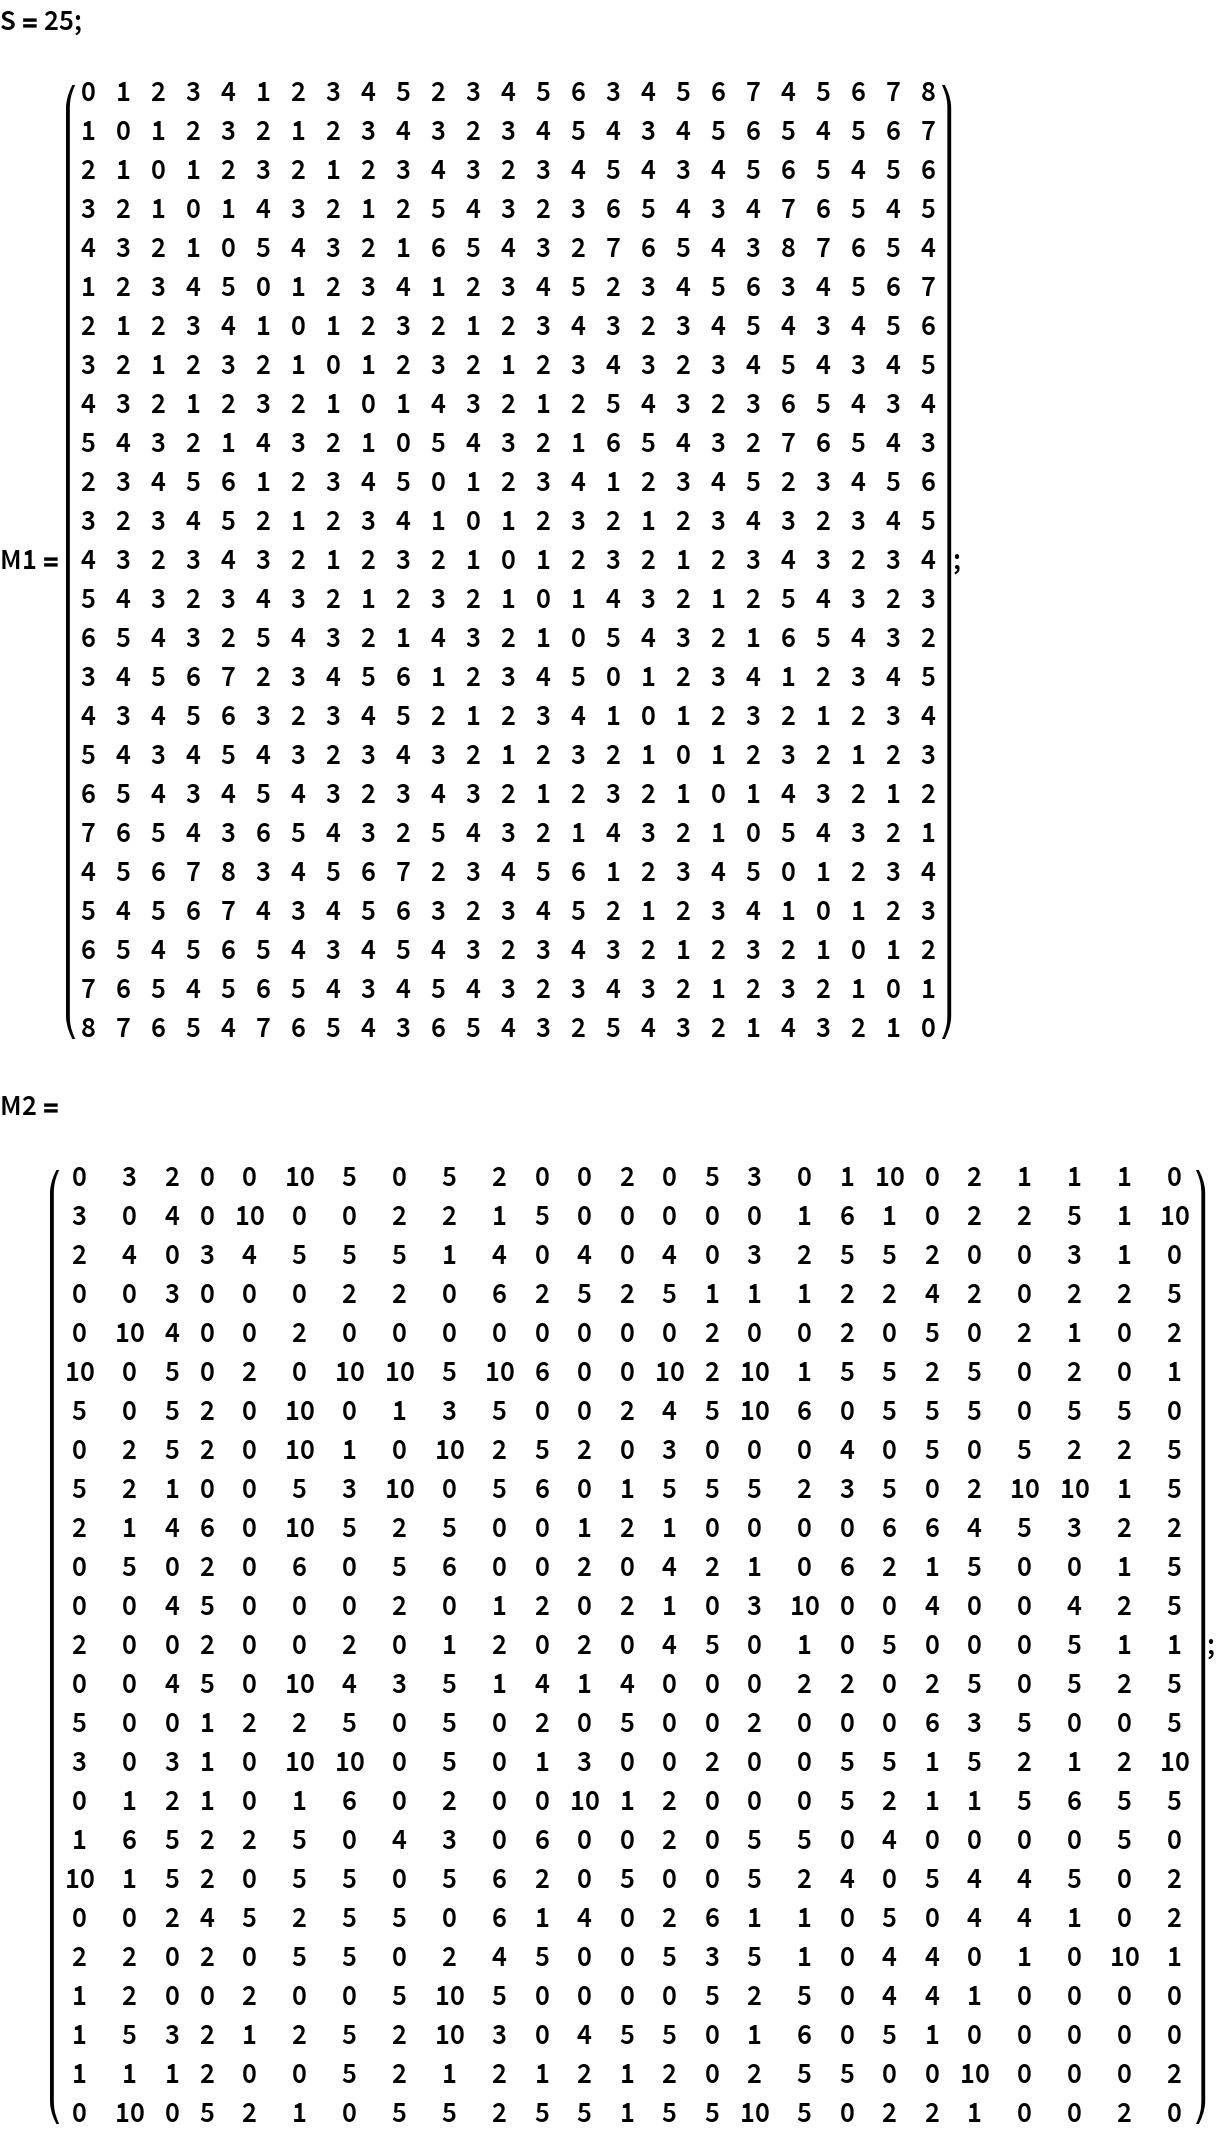 "S = 25; M1 = \!\(\* TagBox[ RowBox[{""("", """", GridBox[{ {""0"", ""1"", ""2"", ""3"", ""4"", ""1"", ""2"", ""3"", ""4"", ""5"", ""2"", ""3"", ""4"", ""5"",           ""6"", ""3"", ""4"", ""5"", ""6"", ""7"", ""4"", ""5"", ""6"", ""7"", ""8""}, {""1"", ""0"", ""1"", ""2"", ""3"", ""2"", ""1"", ""2"", ""3"", ""4"", ""3"", ""2"", ""3"", ""4"",           ""5"", ""4"", ""3"", ""4"", ""5"", ""6"", ""5"", ""4"", ""5"", ""6"", ""7""}, {""2"", ""1"", ""0"", ""1"", ""2"", ""3"", ""2"", ""1"", ""2"", ""3"", ""4"", ""3"", ""2"", ""3"",           ""4"", ""5"", ""4"", ""3"", ""4"", ""5"", ""6"", ""5"", ""4"", ""5"", ""6""}, {""3"", ""2"", ""1"", ""0"", ""1"", ""4"", ""3"", ""2"", ""1"", ""2"", ""5"", ""4"", ""3"", ""2"",           ""3"", ""6"", ""5"", ""4"", ""3"", ""4"", ""7"", ""6"", ""5"", ""4"", ""5""}, {""4"", ""3"", ""2"", ""1"", ""0"", ""5"", ""4"", ""3"", ""2"", ""1"", ""6"", ""5"", ""4"", ""3"",           ""2"", ""7"", ""6"", ""5"", ""4"", ""3"", ""8"", ""7"", ""6"", ""5"", ""4""}, {""1"", ""2"", ""3"", ""4"", ""5"", ""0"", ""1"", ""2"", ""3"", ""4"", ""1"", ""2"", ""3"", ""4"",           ""5"", ""2"", ""3"", ""4"", ""5"", ""6"", ""3"", ""4"", ""5"", ""6"", ""7""}, {""2"", ""1"", ""2"", ""3"", ""4"", ""1"", ""0"", ""1"", ""2"", ""3"", ""2"", ""1"", ""2"", ""3"",           ""4"", ""3"", ""2"", ""3"", ""4"", ""5"", ""4"", ""3"", ""4"", ""5"", ""6""}, {""3"", ""2"", ""1"", ""2"", ""3"", ""2"", ""1"", ""0"", ""1"", ""2"", ""3"", ""2"", ""1"", ""2"",           ""3"", ""4"", ""3"", ""2"", ""3"", ""4"", ""5"", ""4"", ""3"", ""4"", ""5""}, {""4"", ""3"", ""2"", ""1"", ""2"", ""3"", ""2"", ""1"", ""0"", ""1"", ""4"", ""3"", ""2"", ""1"",           ""2"", ""5"", ""4"", ""3"", ""2"", ""3"", ""6"", ""5"", ""4"", ""3"", ""4""}, {""5"", ""4"", ""3"", ""2"", ""1"", ""4"", ""3"", ""2"", ""1"", ""0"", ""5"", ""4"", ""3"", ""2"",           ""1"", ""6"", ""5"", ""4"", ""3"", ""2"", ""7"", ""6"", ""5"", ""4"", ""3""}, {""2"", ""3"", ""4"", ""5"", ""6"", ""1"", ""2"", ""3"", ""4"", ""5"", ""0"", ""1"", ""2"", ""3"",           ""4"", ""1"", ""2"", ""3"", ""4"", ""5"", ""2"", ""3"", ""4"", ""5"", ""6""}, {""3"", ""2"", ""3"", ""4"", ""5"", ""2"", ""1"", ""2"", ""3"", ""4"", ""1"", ""0"", ""1"", ""2"",           ""3"", ""2"", ""1"", ""2"", ""3"", ""4"", ""3"", ""2"", ""3"", ""4"", ""5""}, {""4"", ""3"", ""2"", ""3"", ""4"", ""3"", ""2"", ""1"", ""2"", ""3"", ""2"", ""1"", ""0"", ""1"",           ""2"", ""3"", ""2"", ""1"", ""2"", ""3"", ""4"", ""3"", ""2"", ""3"", ""4""}, {""5"", ""4"", ""3"", ""2"", ""3"", ""4"", ""3"", ""2"", ""1"", ""2"", ""3"", ""2"", ""1"", ""0"",           ""1"", ""4"", ""3"", ""2"", ""1"", ""2"", ""5"", ""4"", ""3"", ""2"", ""3""}, {""6"", ""5"", ""4"", ""3"", ""2"", """